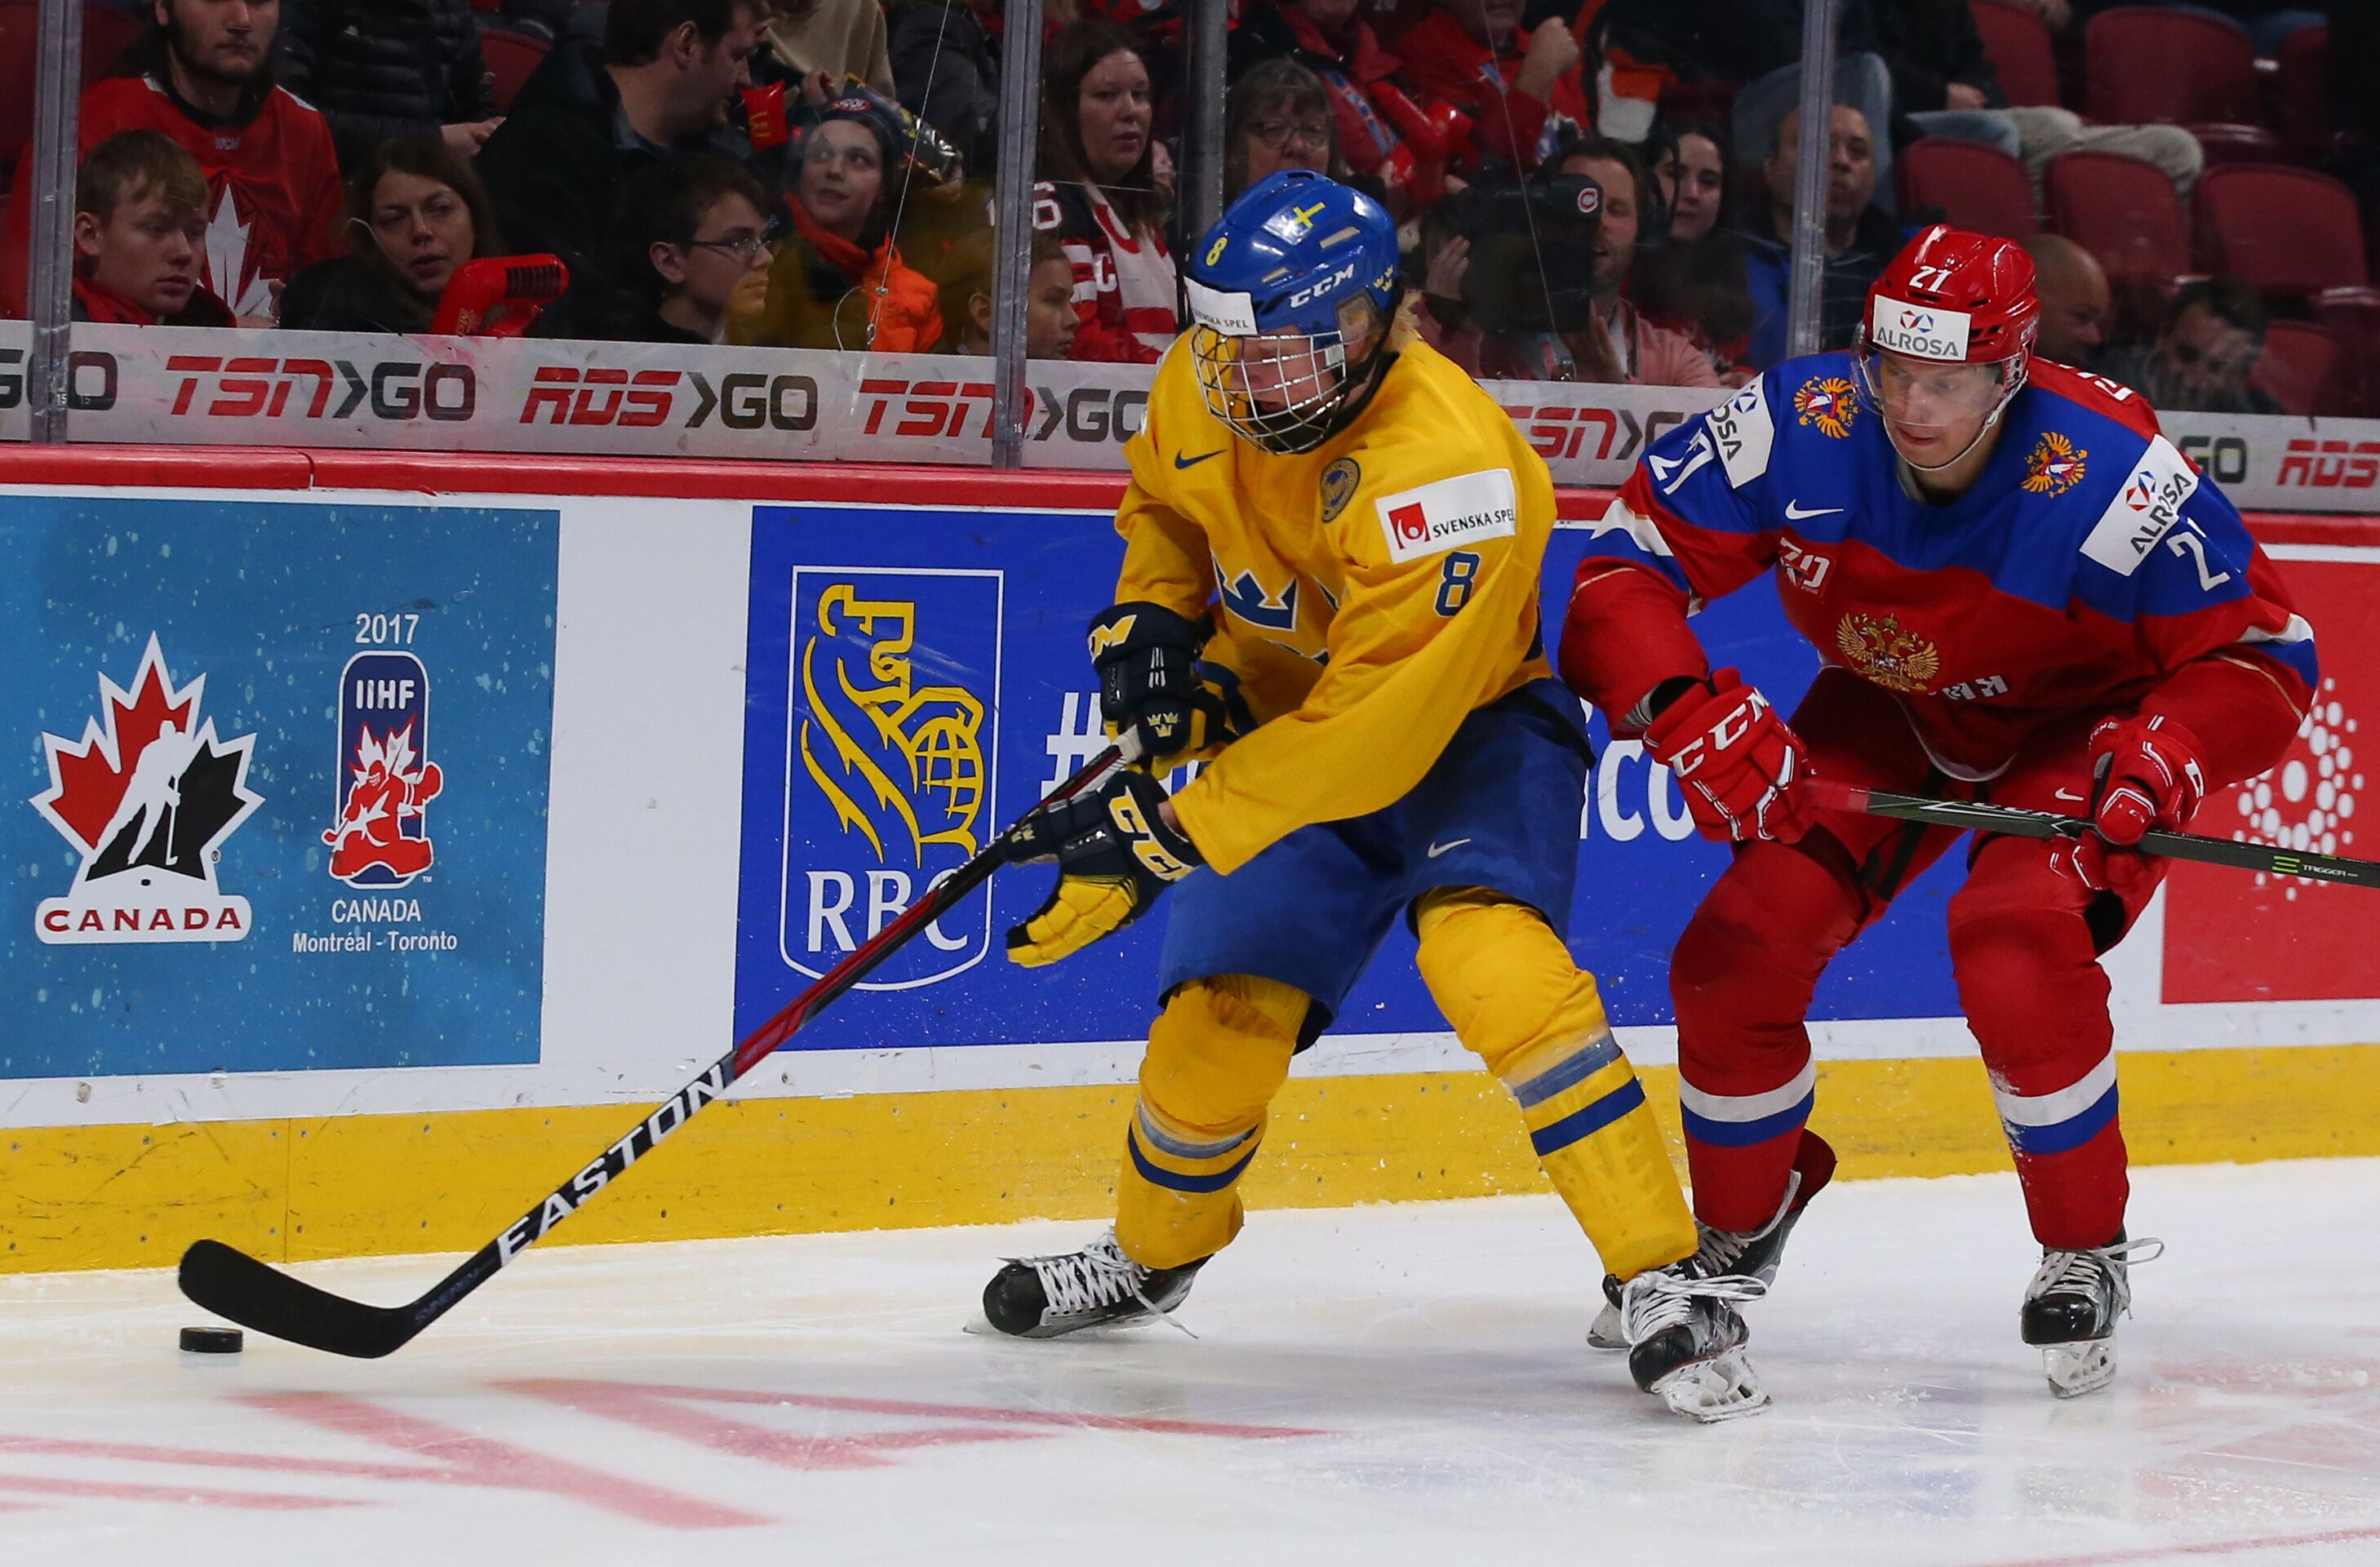 631059974-russia-claims-bronze-at-2017-world-junior-ice-hockey-championships.jpg